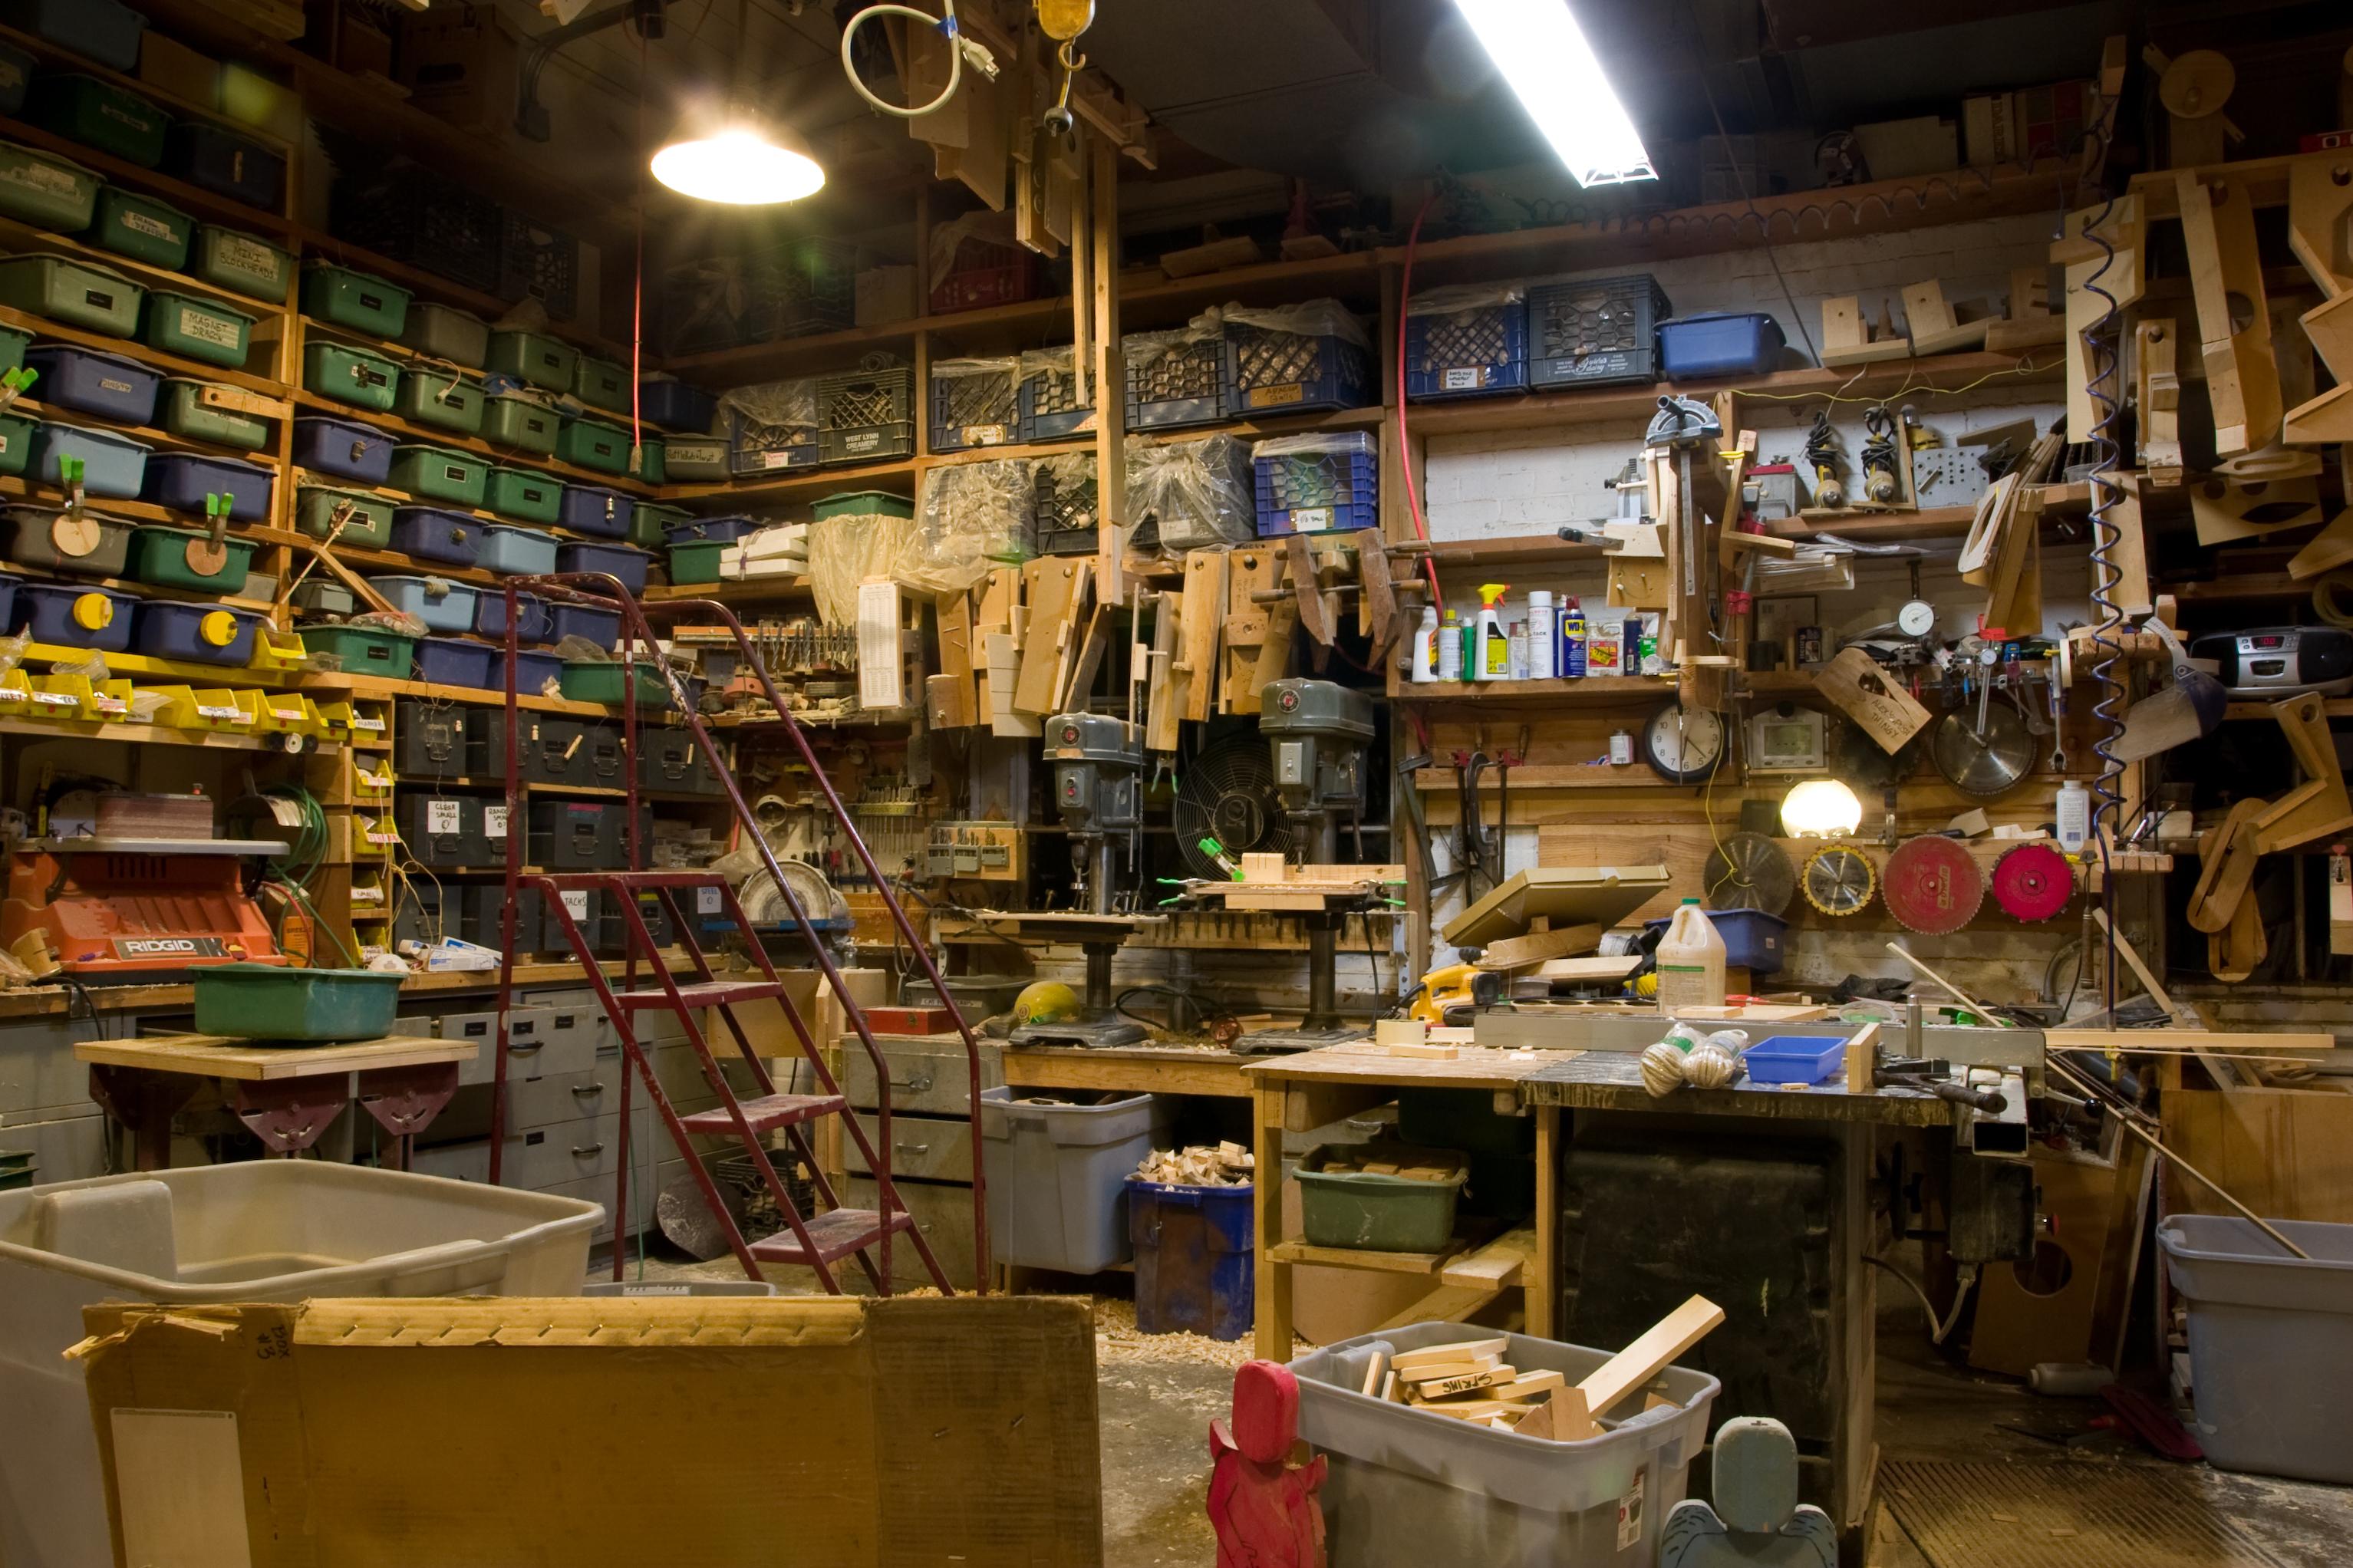 work shops: